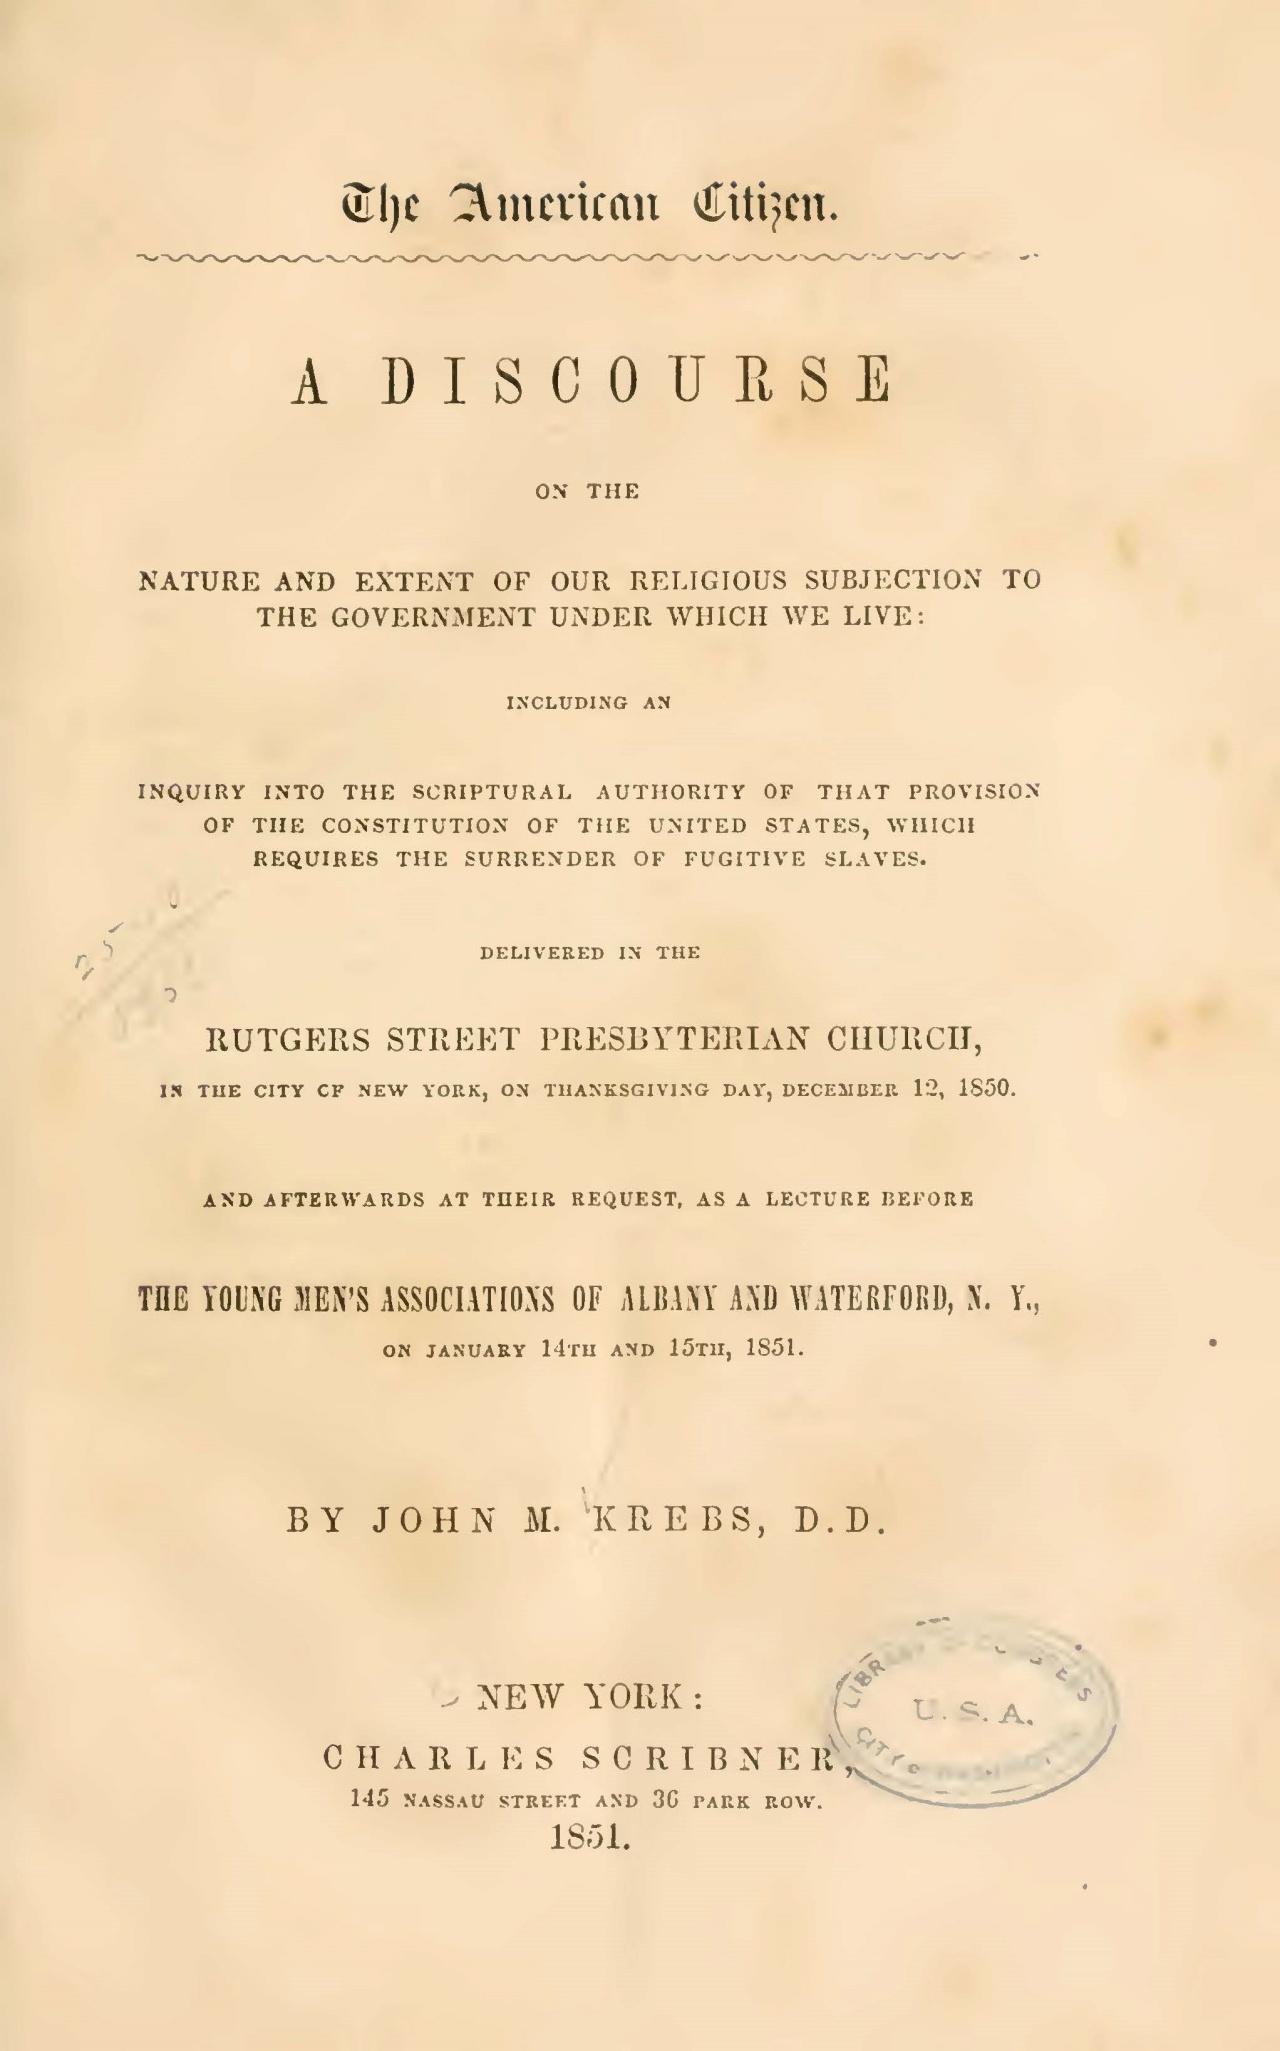 Krebs, John Michael, The American Citizen Title Page.jpg